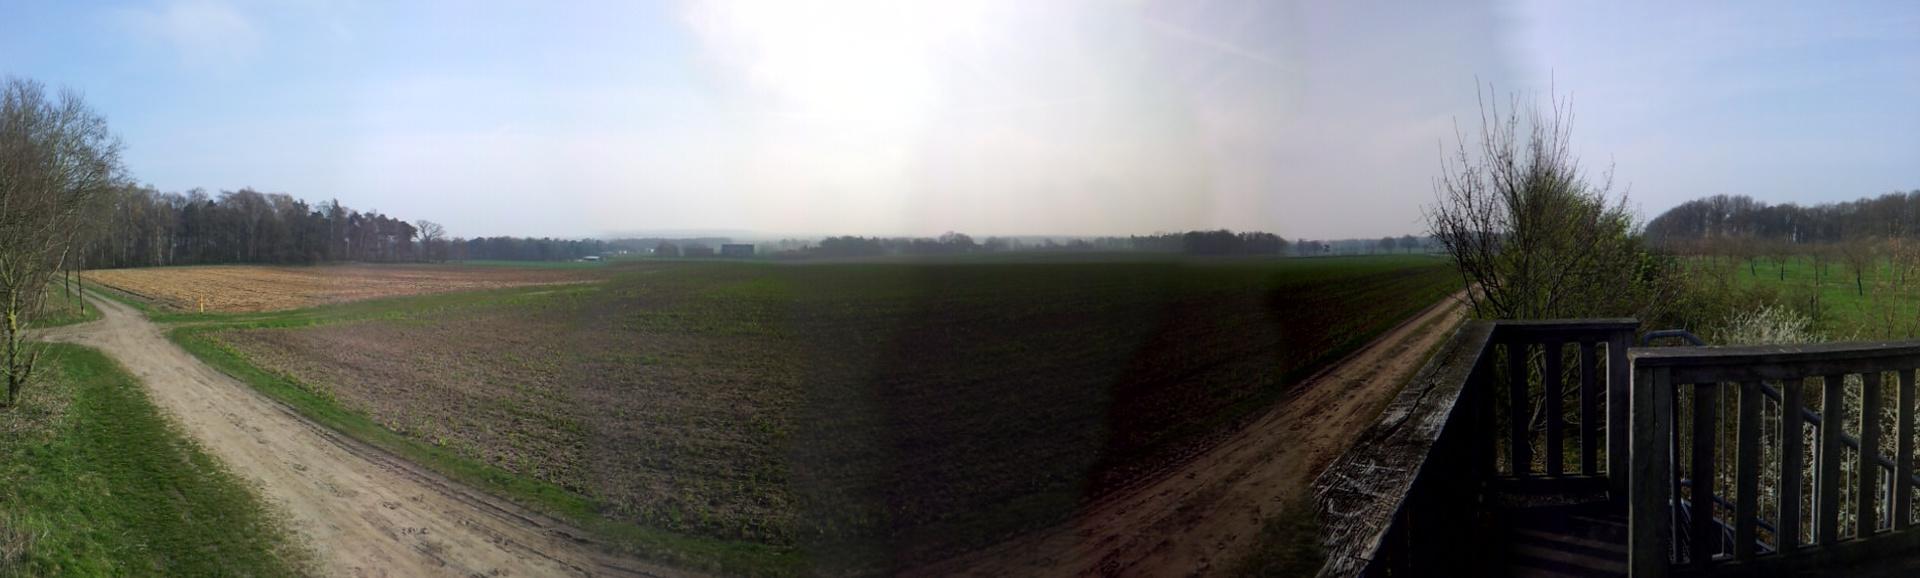 Das Lohner Moor